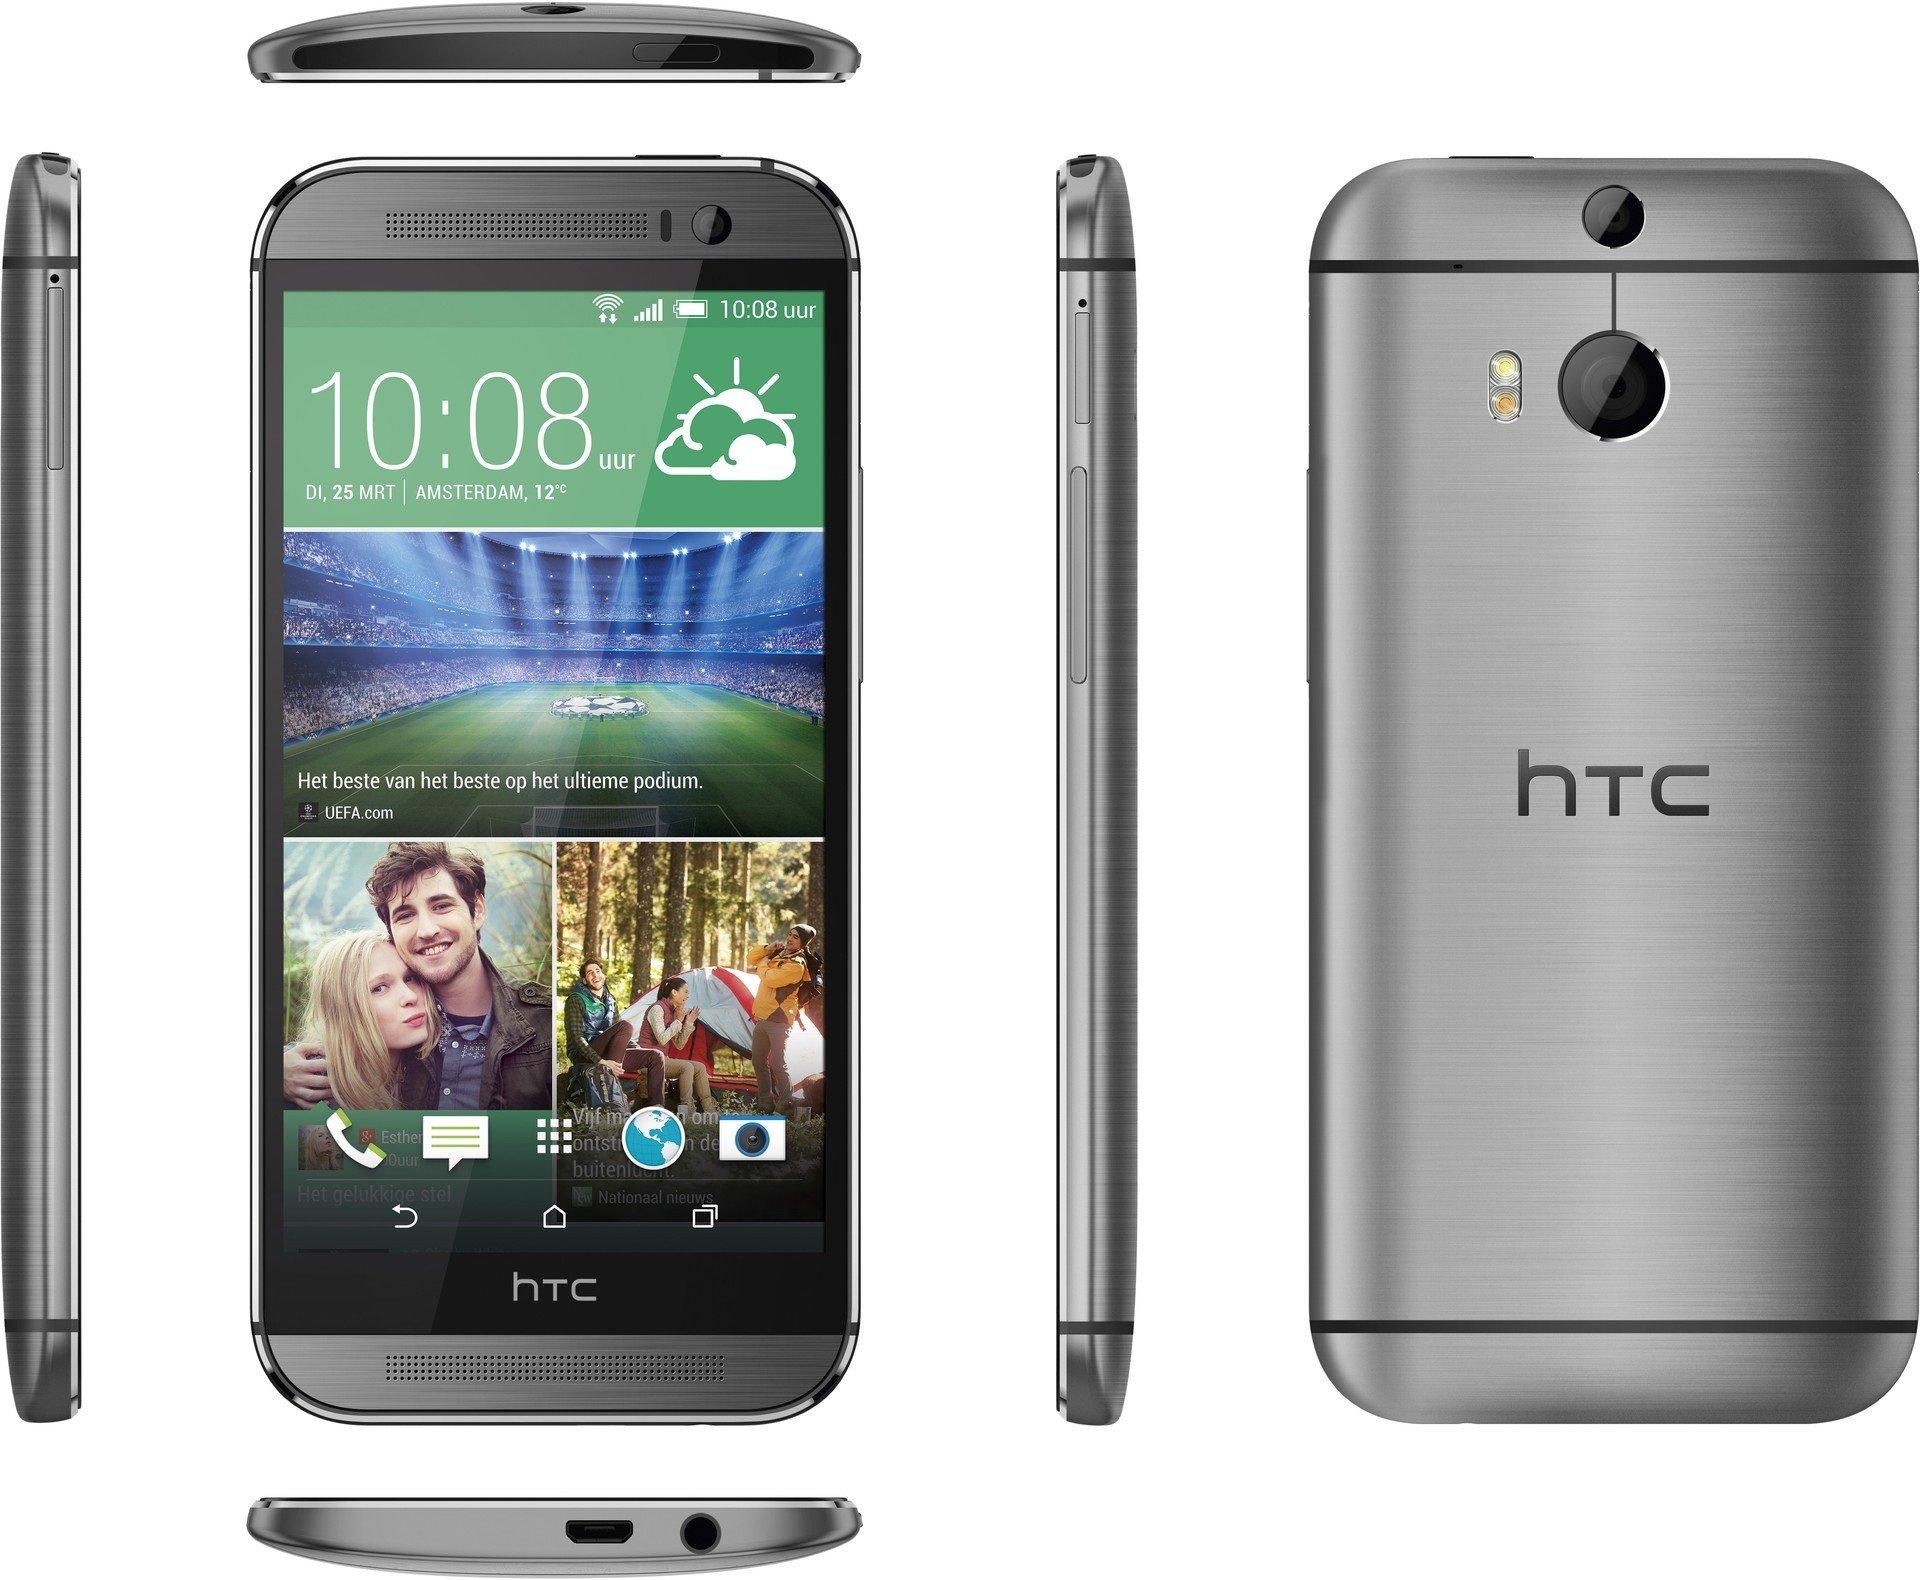 Sony Xperia Z2, Sony Xperia Z3, HTC One (M8), Samsung Galaxy S5 и LG G3 в борьбе за звание чемпиона - Изображение 2